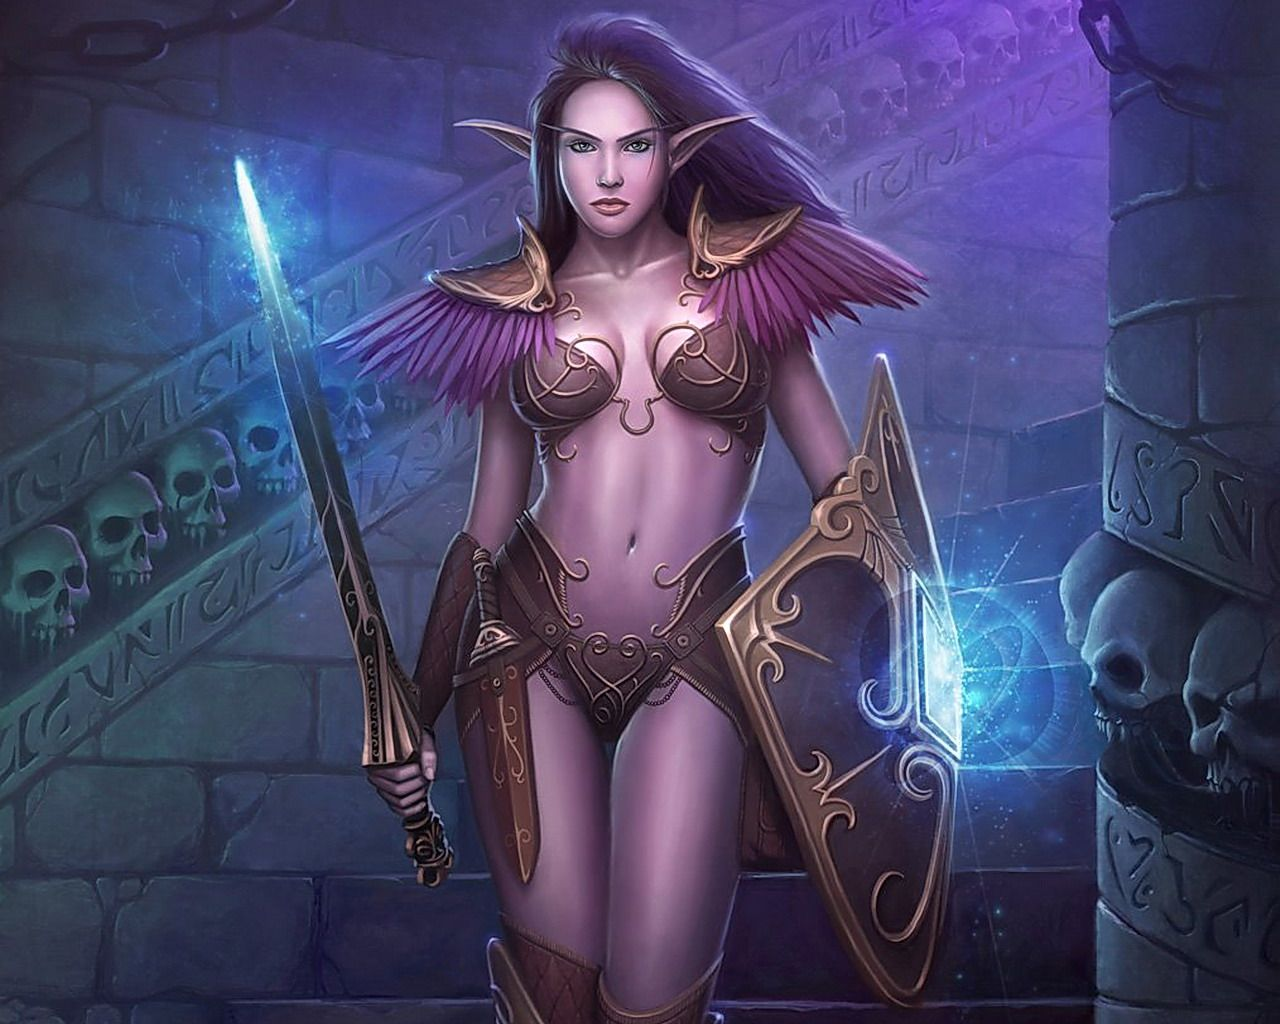 amelia vega topless nude pics